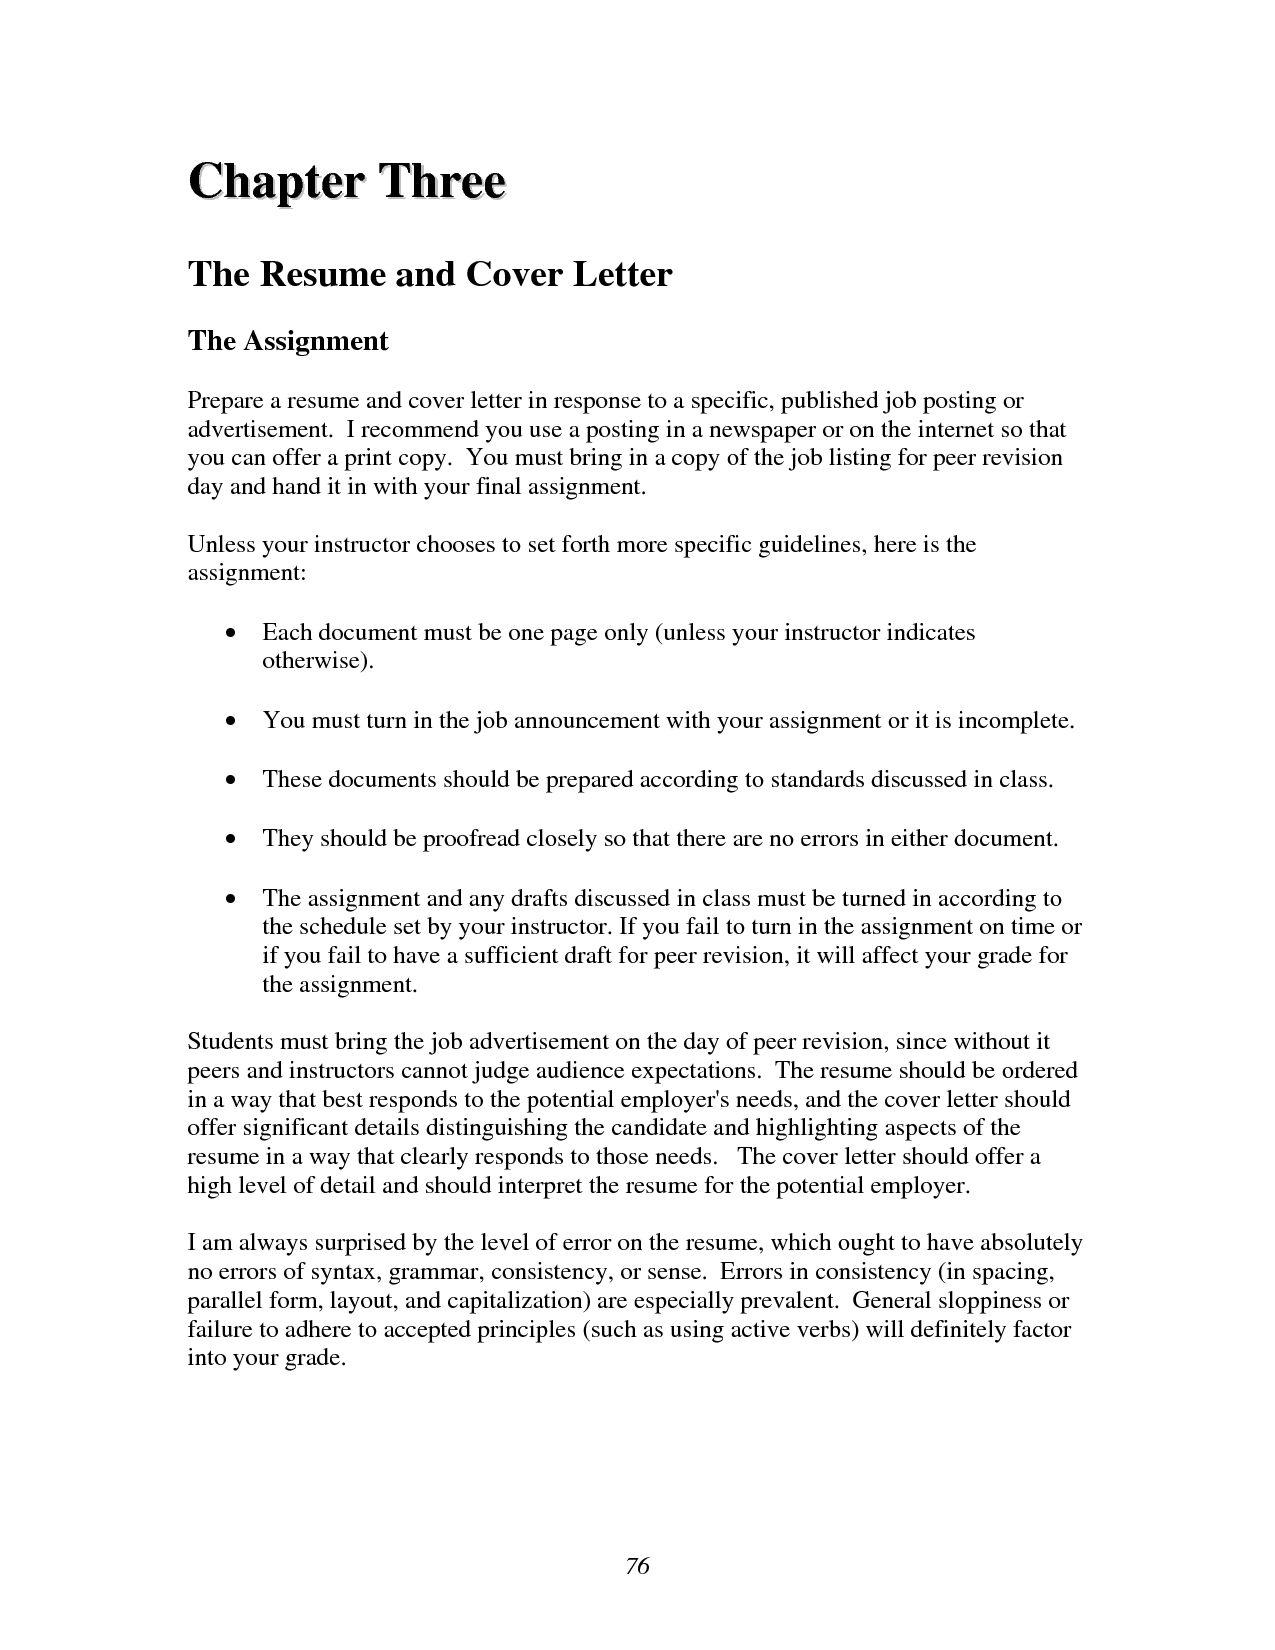 Cover Letter Template Veterinary Receptionist Resume Format Job Posting Cover Letter For Resume Lettering